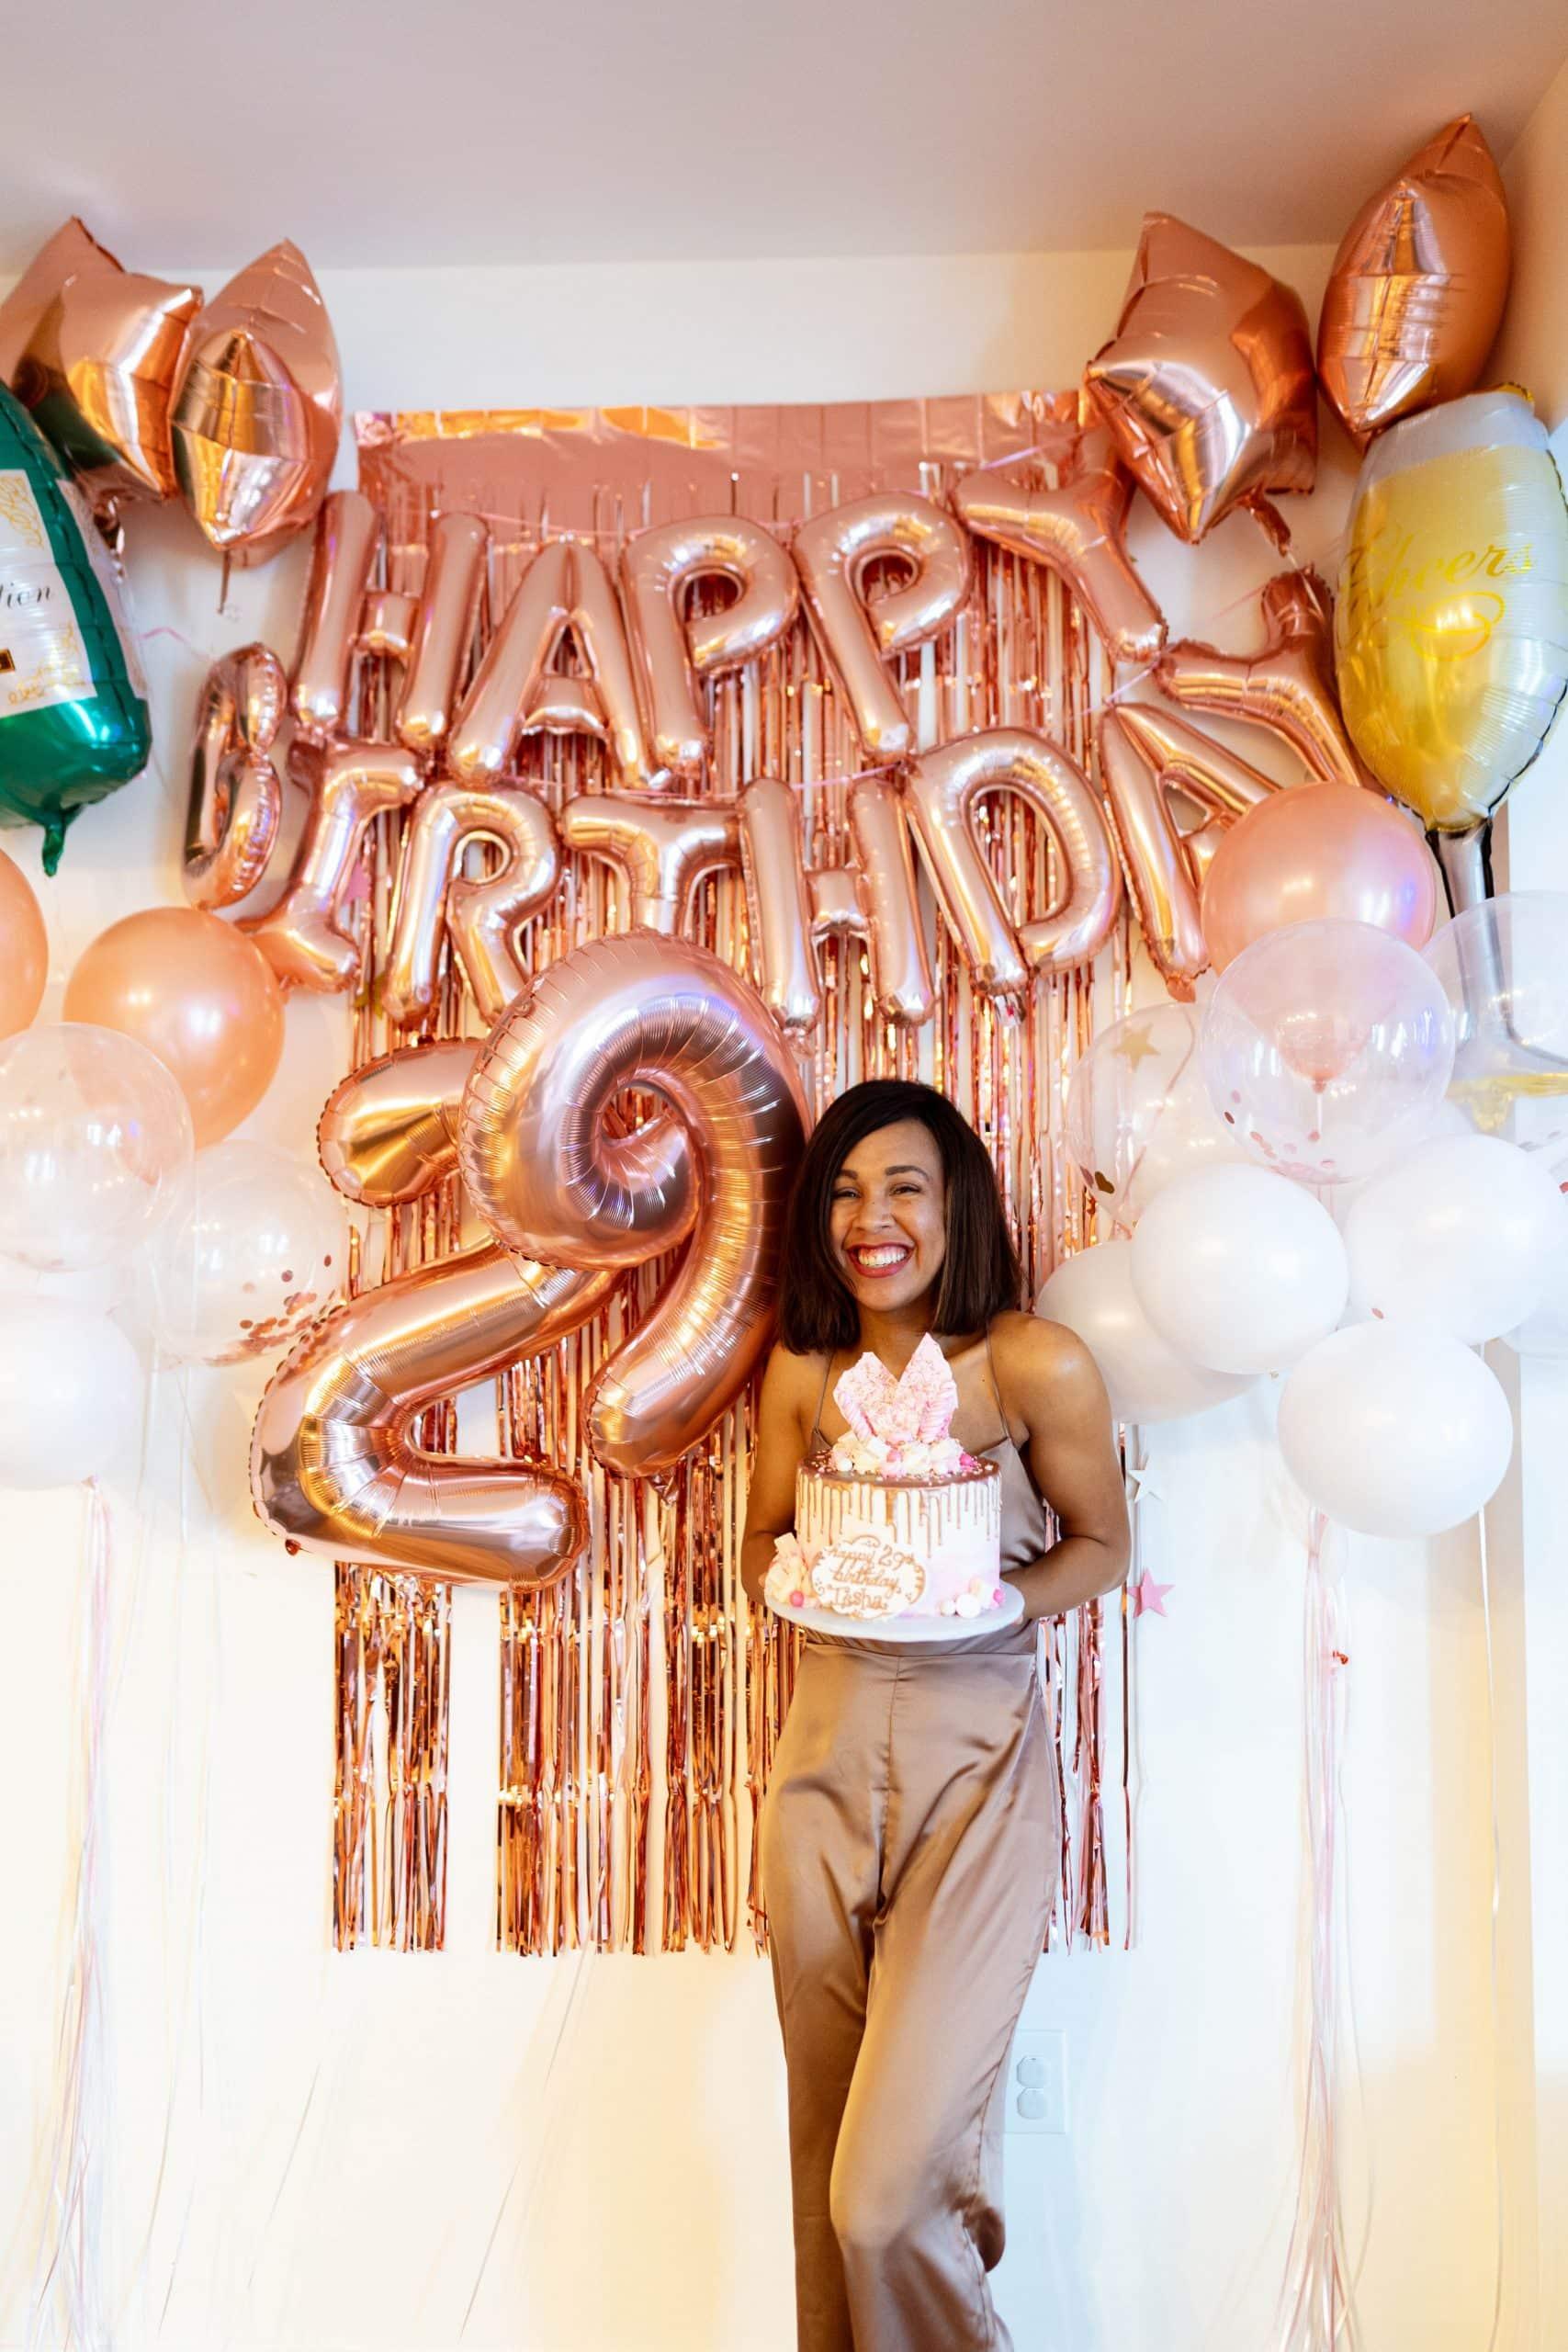 livinglesh 29th birthday party theme